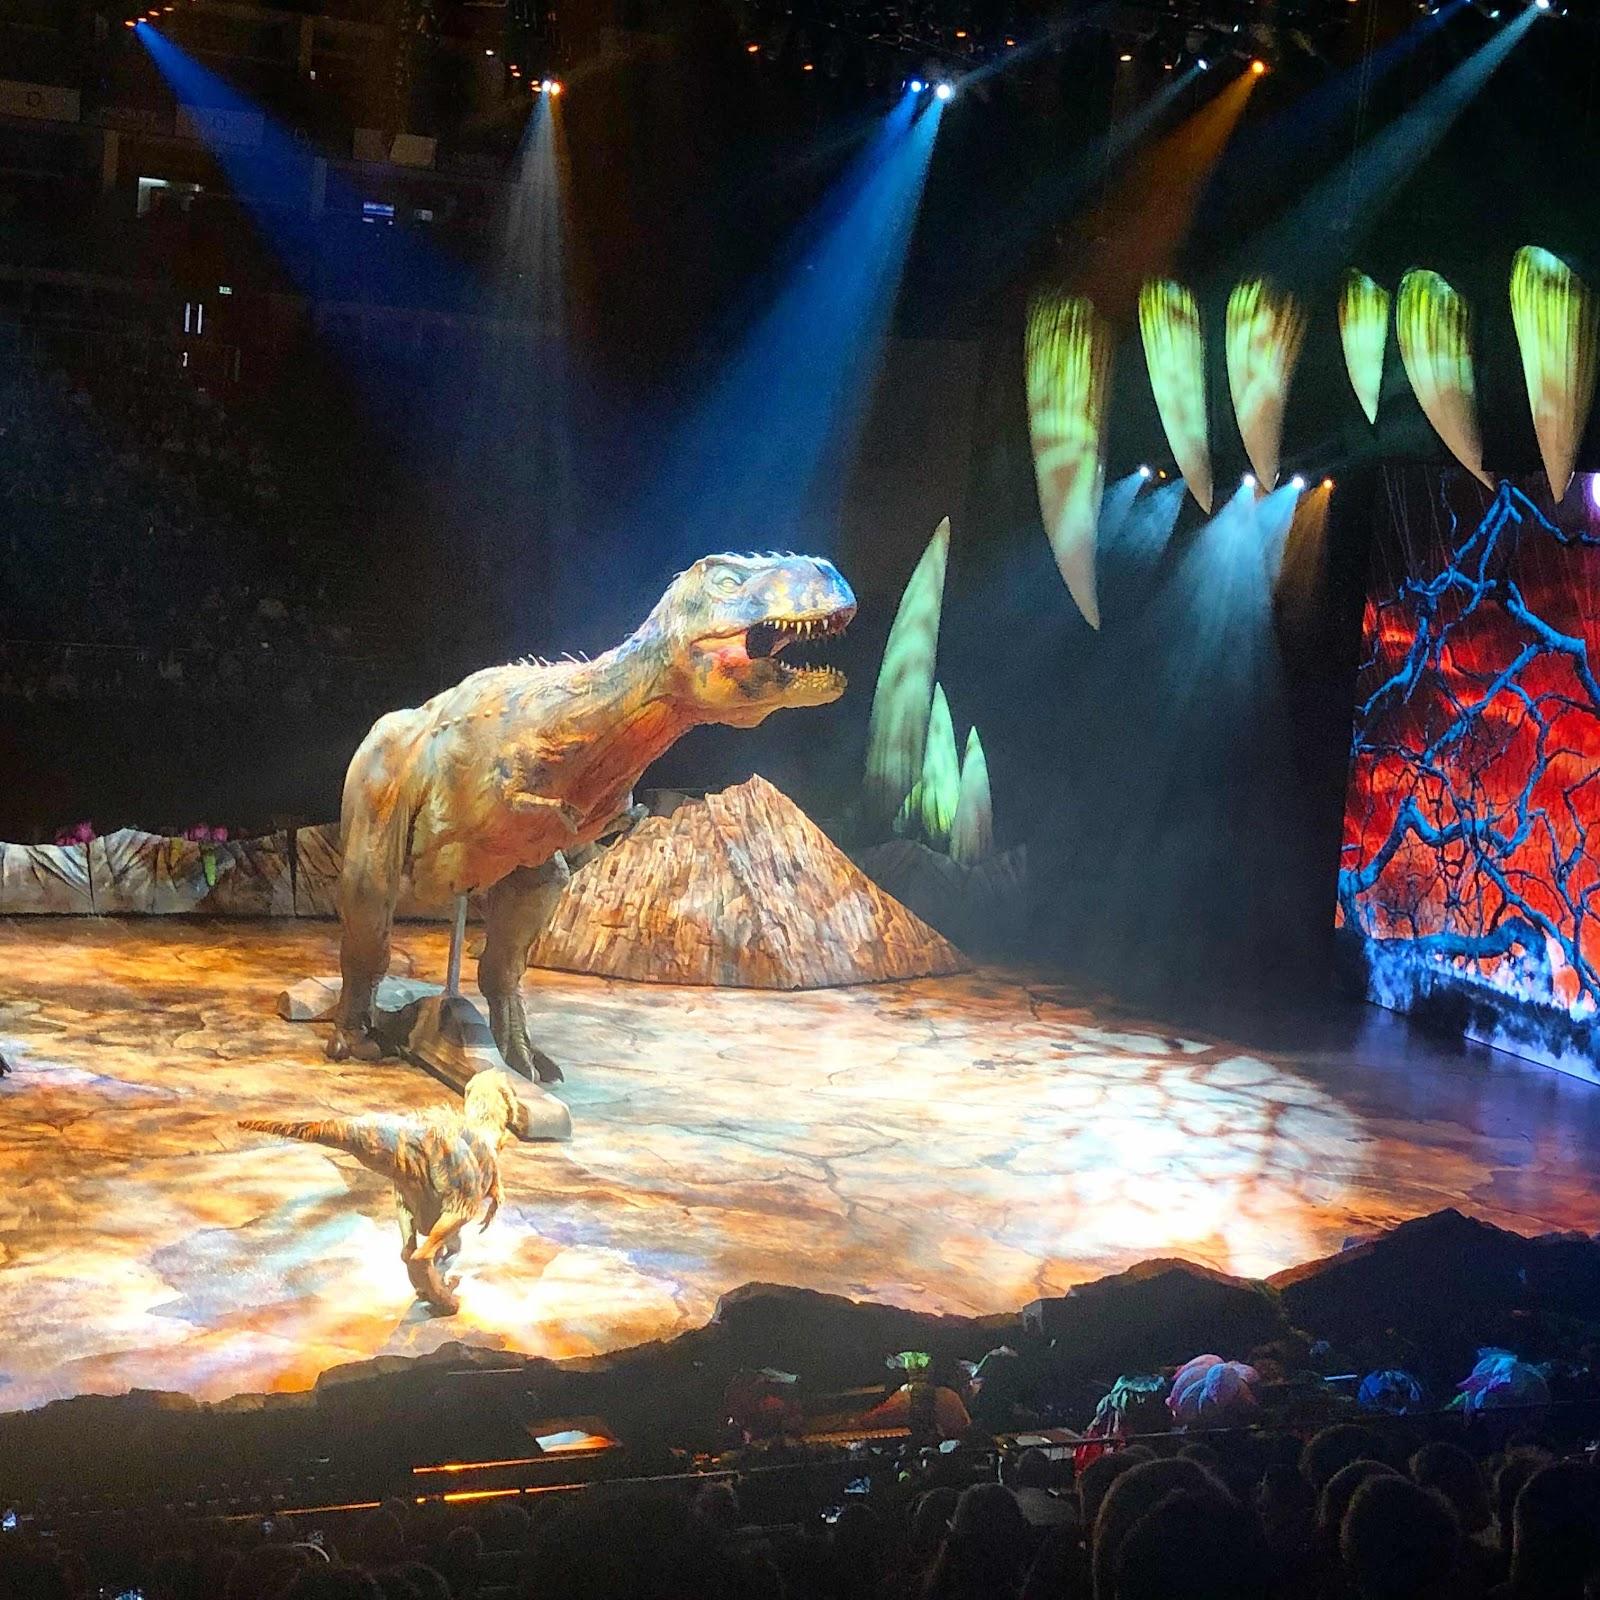 london-lifestyle-blog-walking-with-dinosaurs